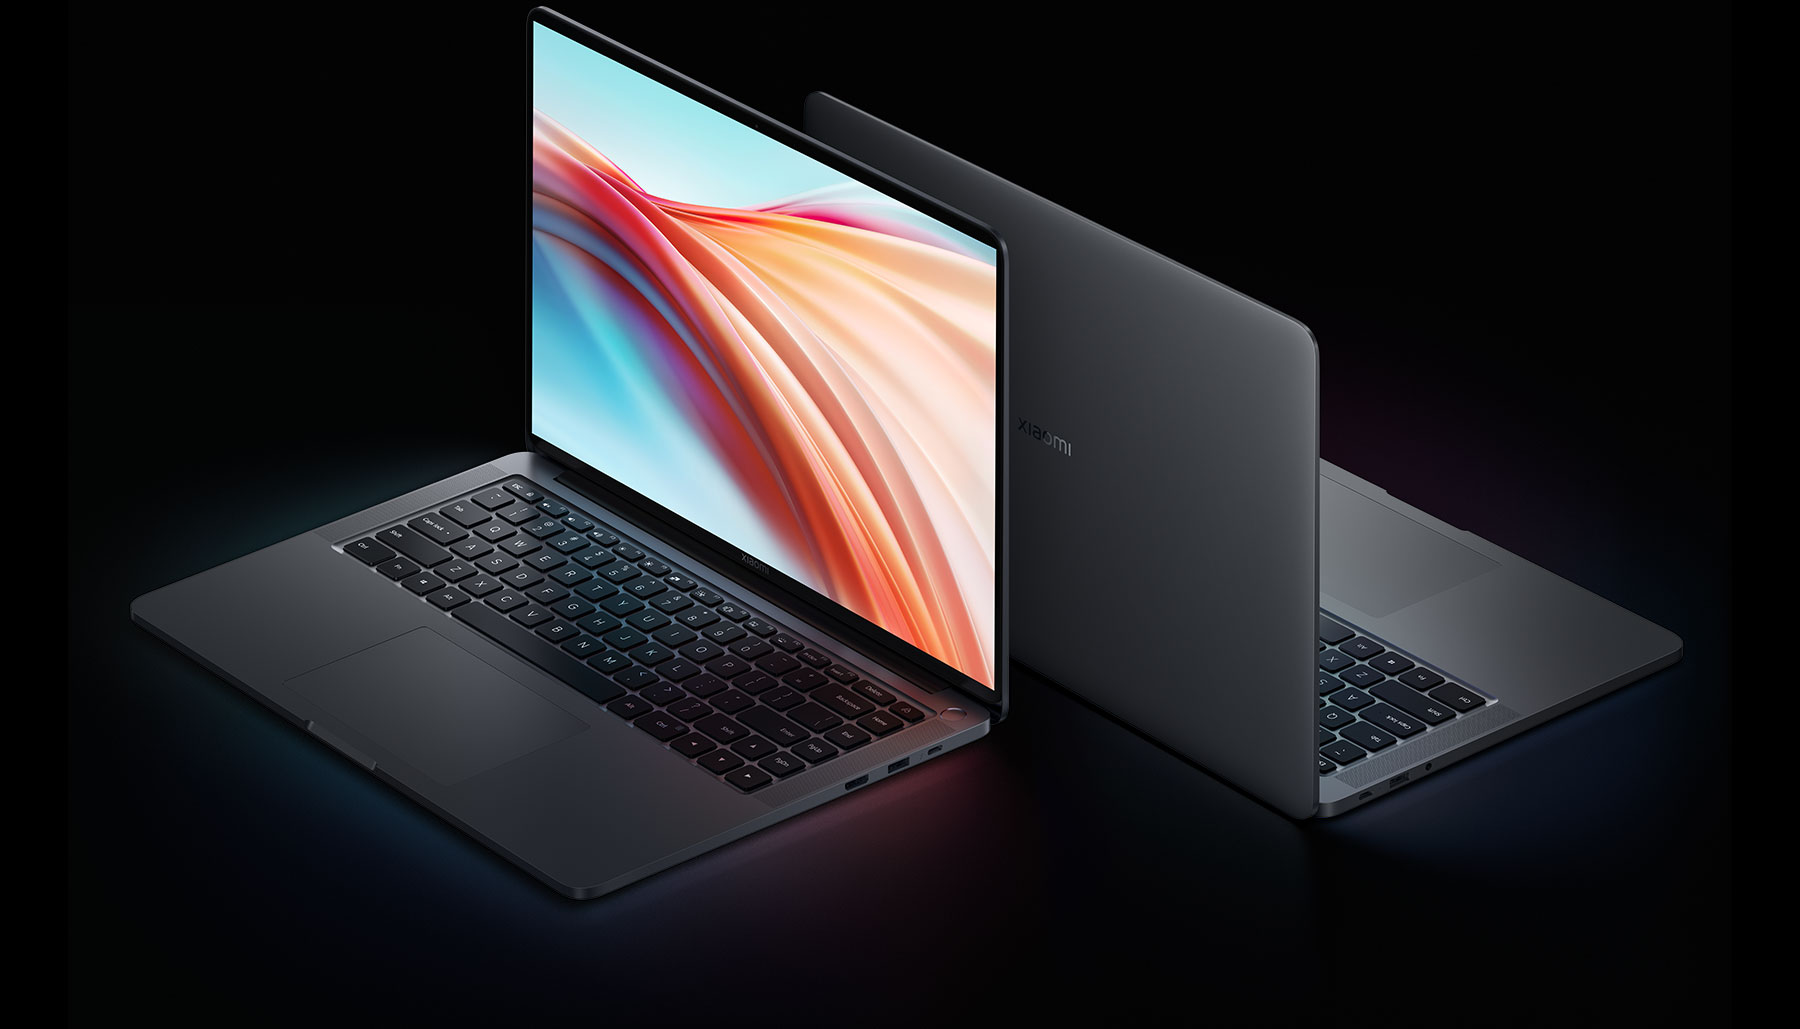 Mi Notebook Pro X